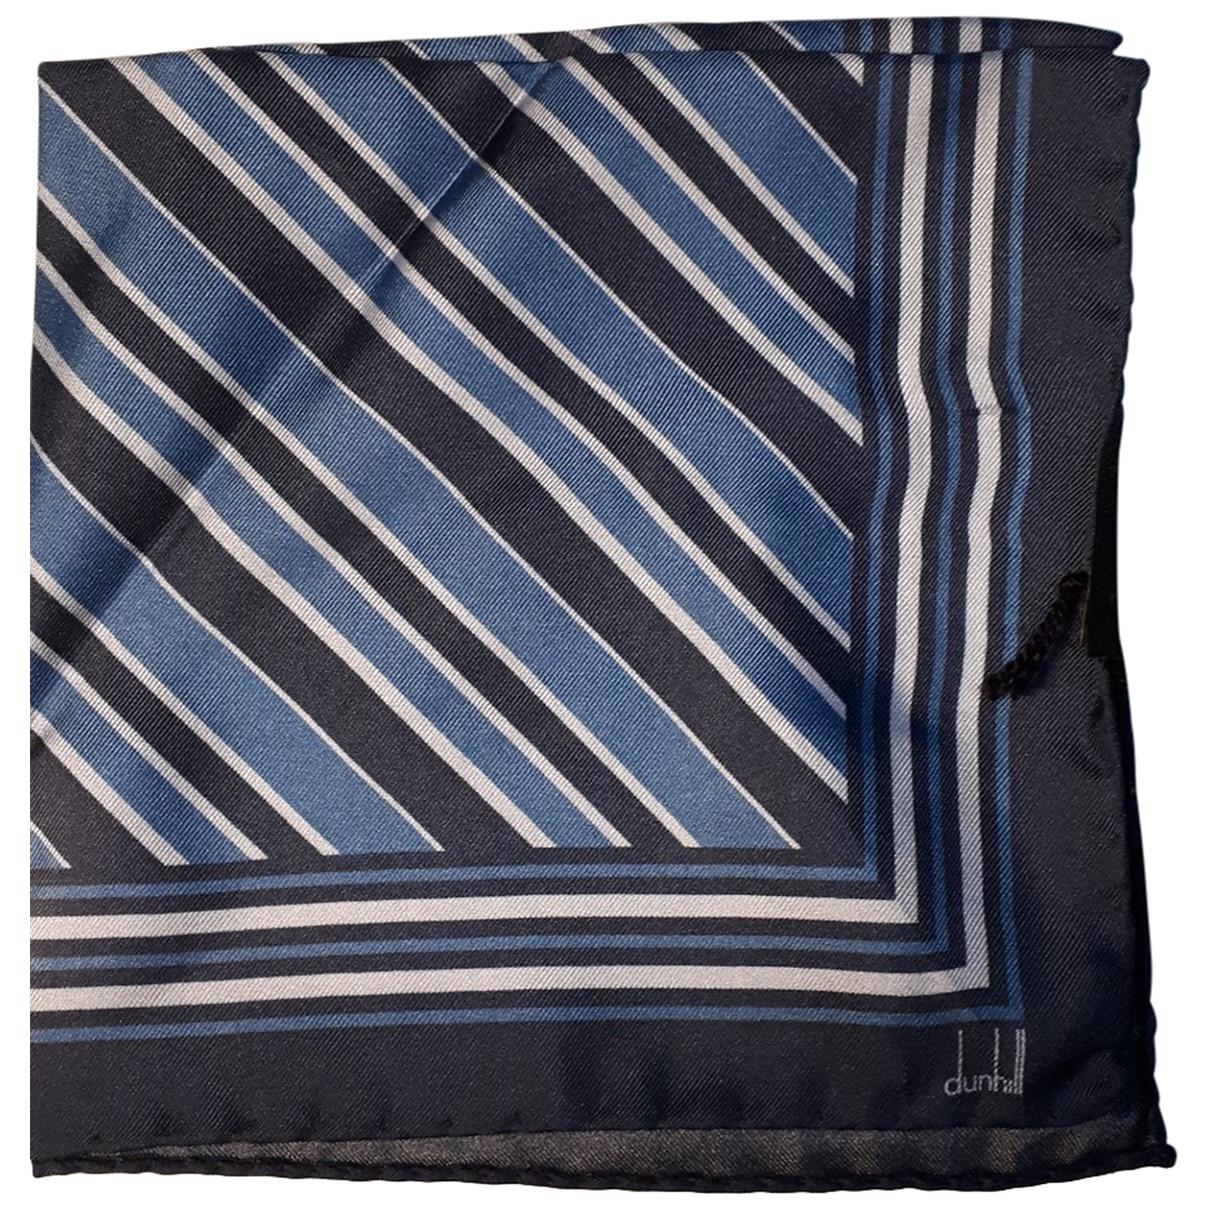 Pañuelo / bufanda de Seda Alfred Dunhill